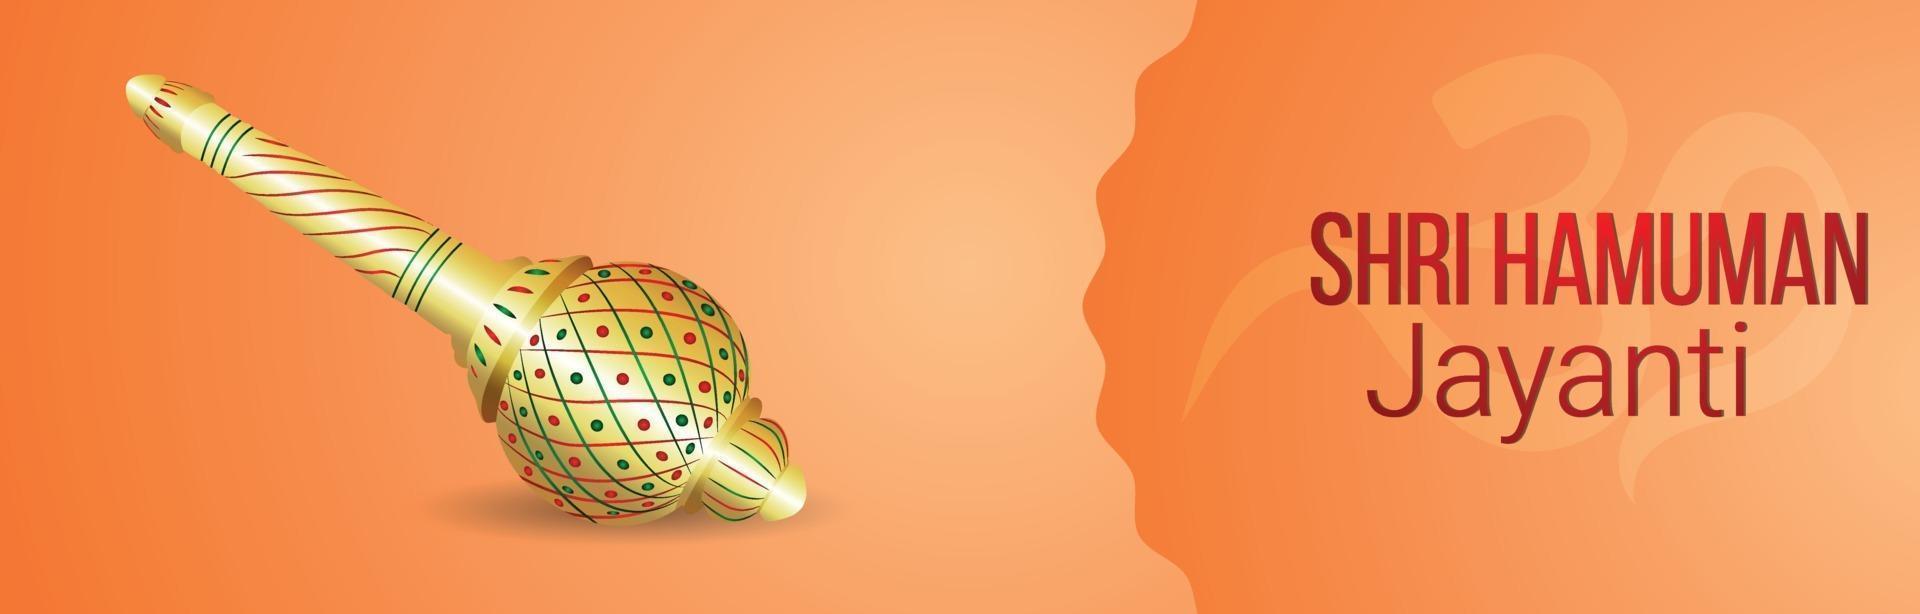 hanuman jayanti firande banner eller rubrik vektor